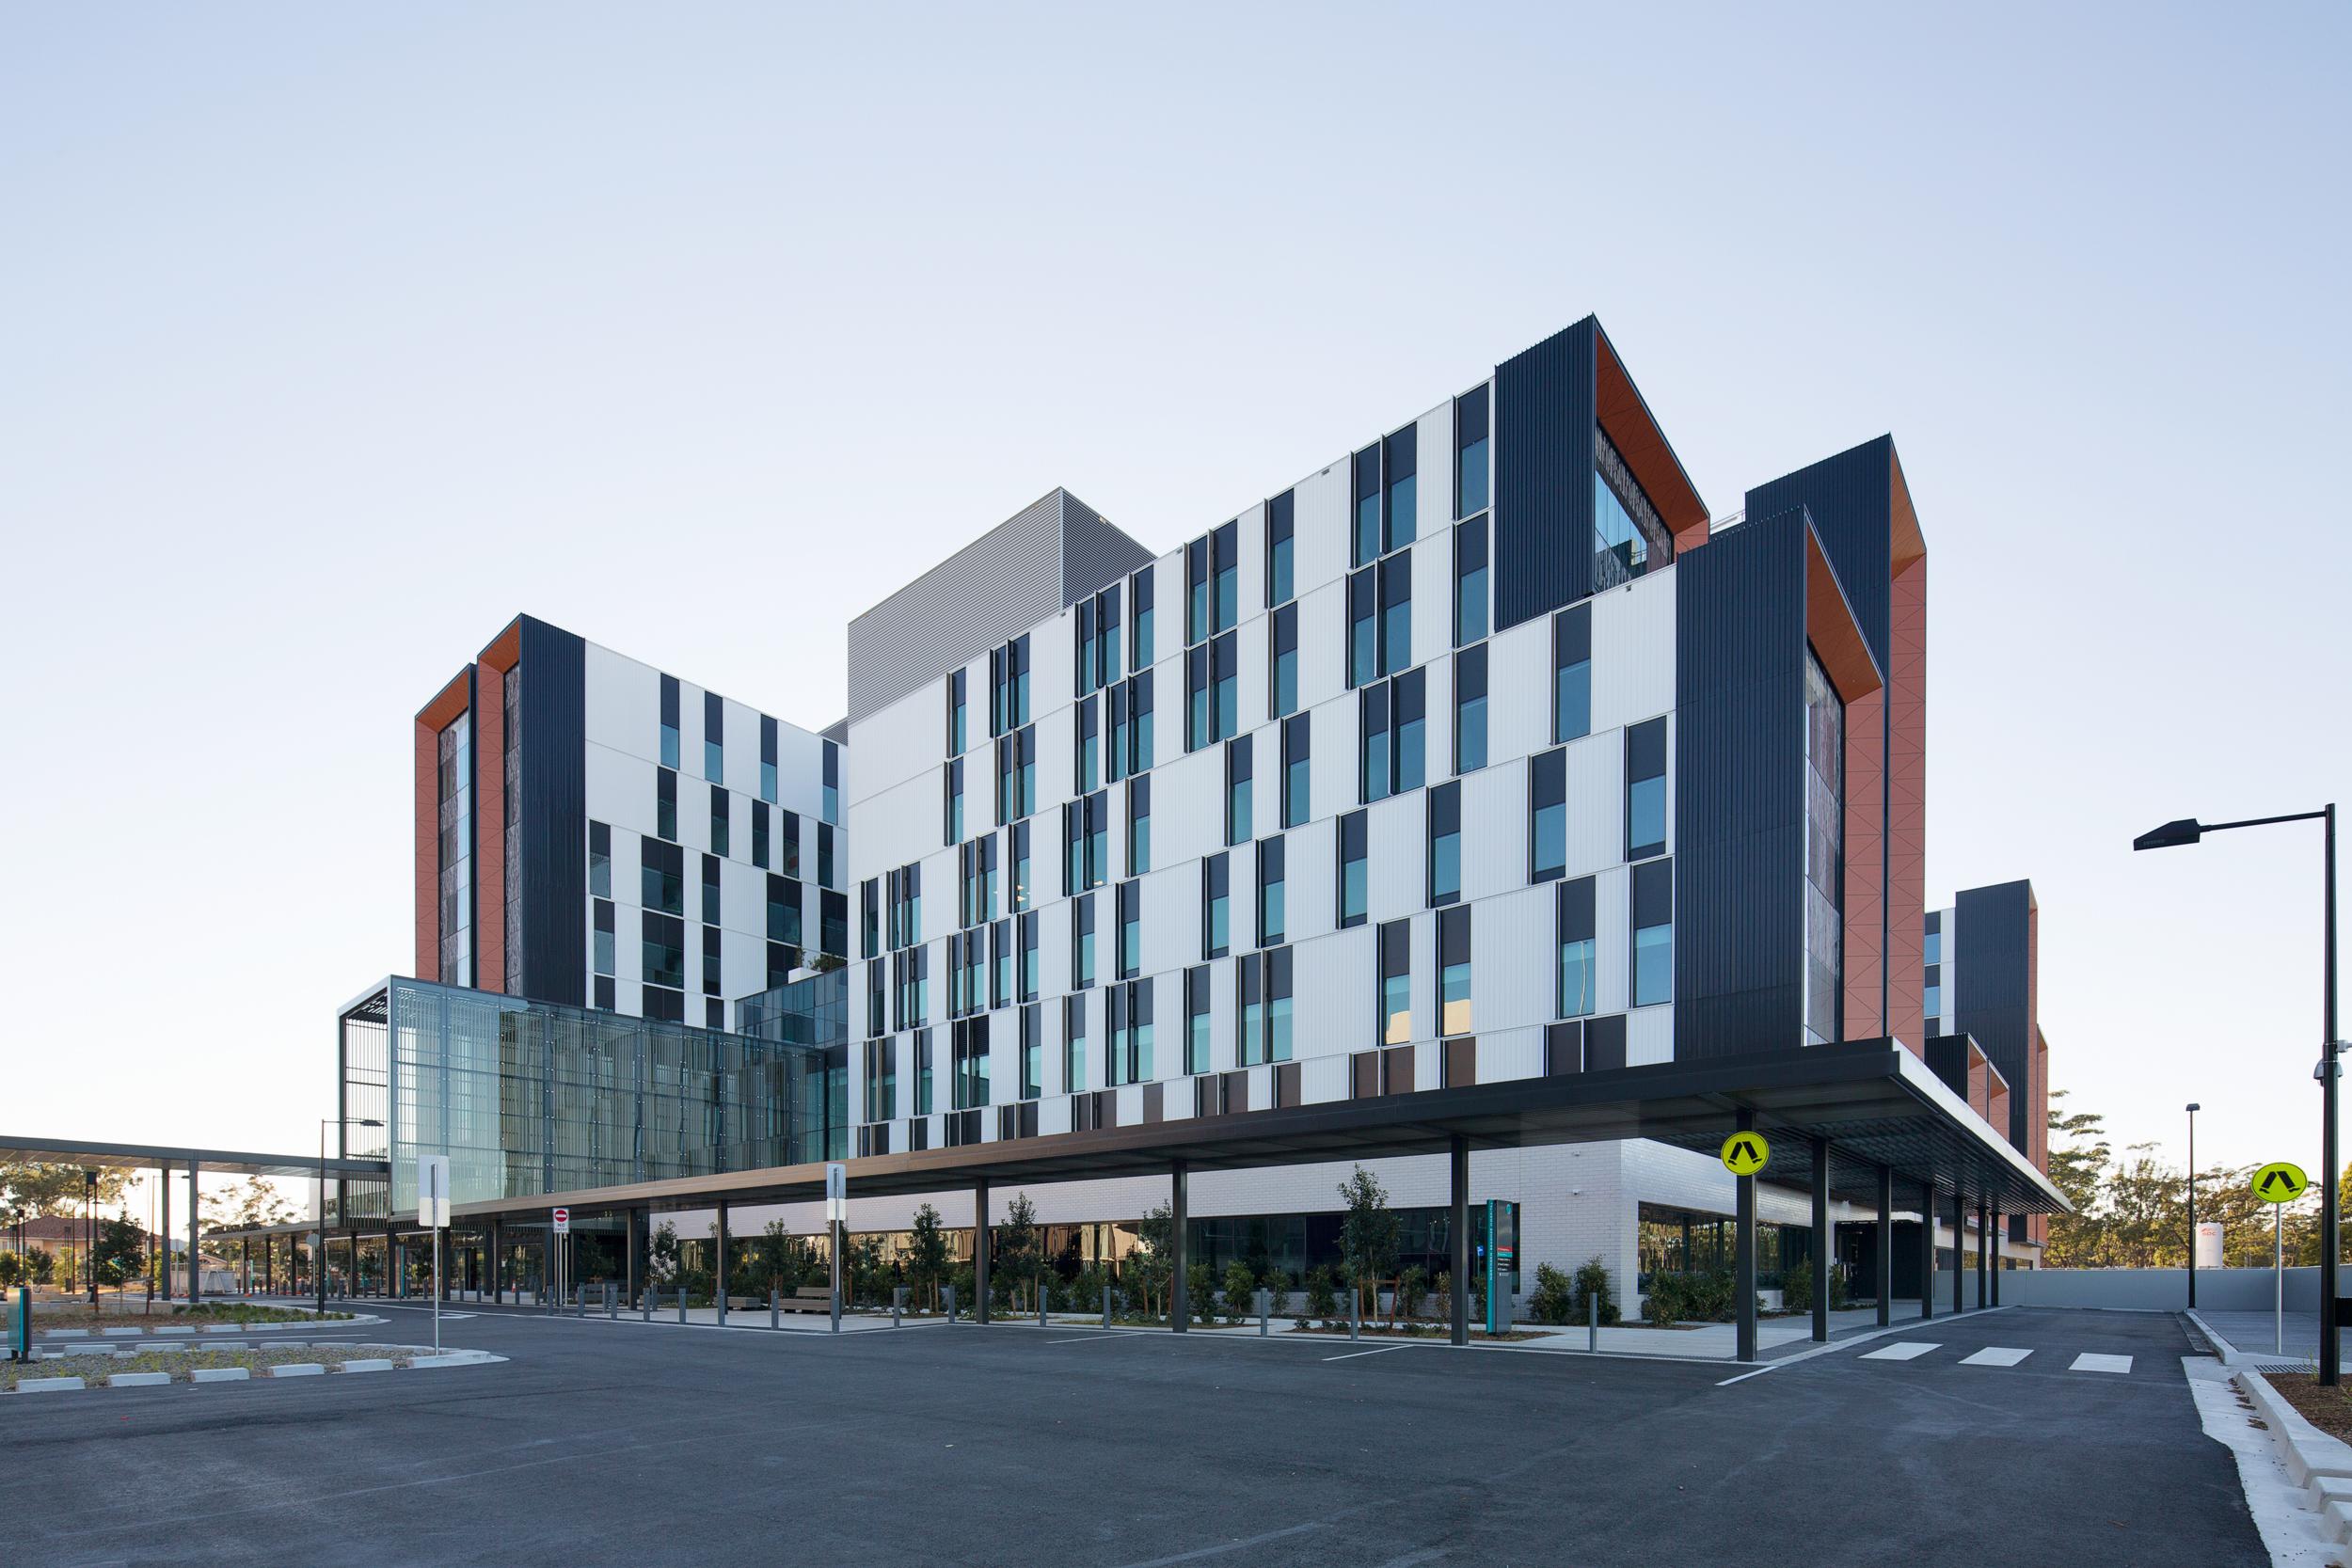 Northern Beaches Hospital